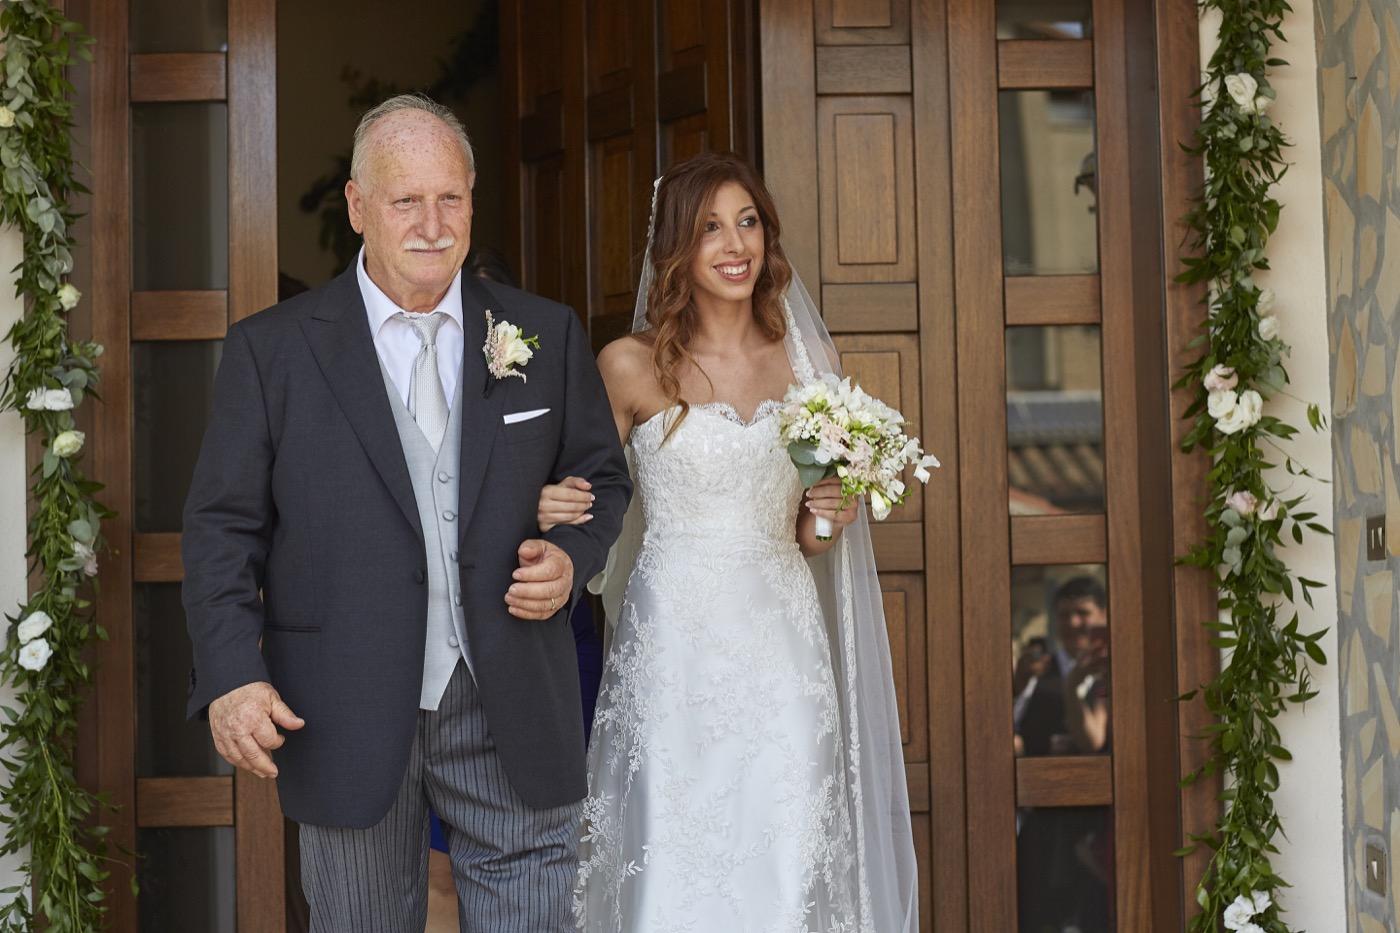 Claudio-Coppola-wedding-photographer-abbazia-7-frati-piegaro-35